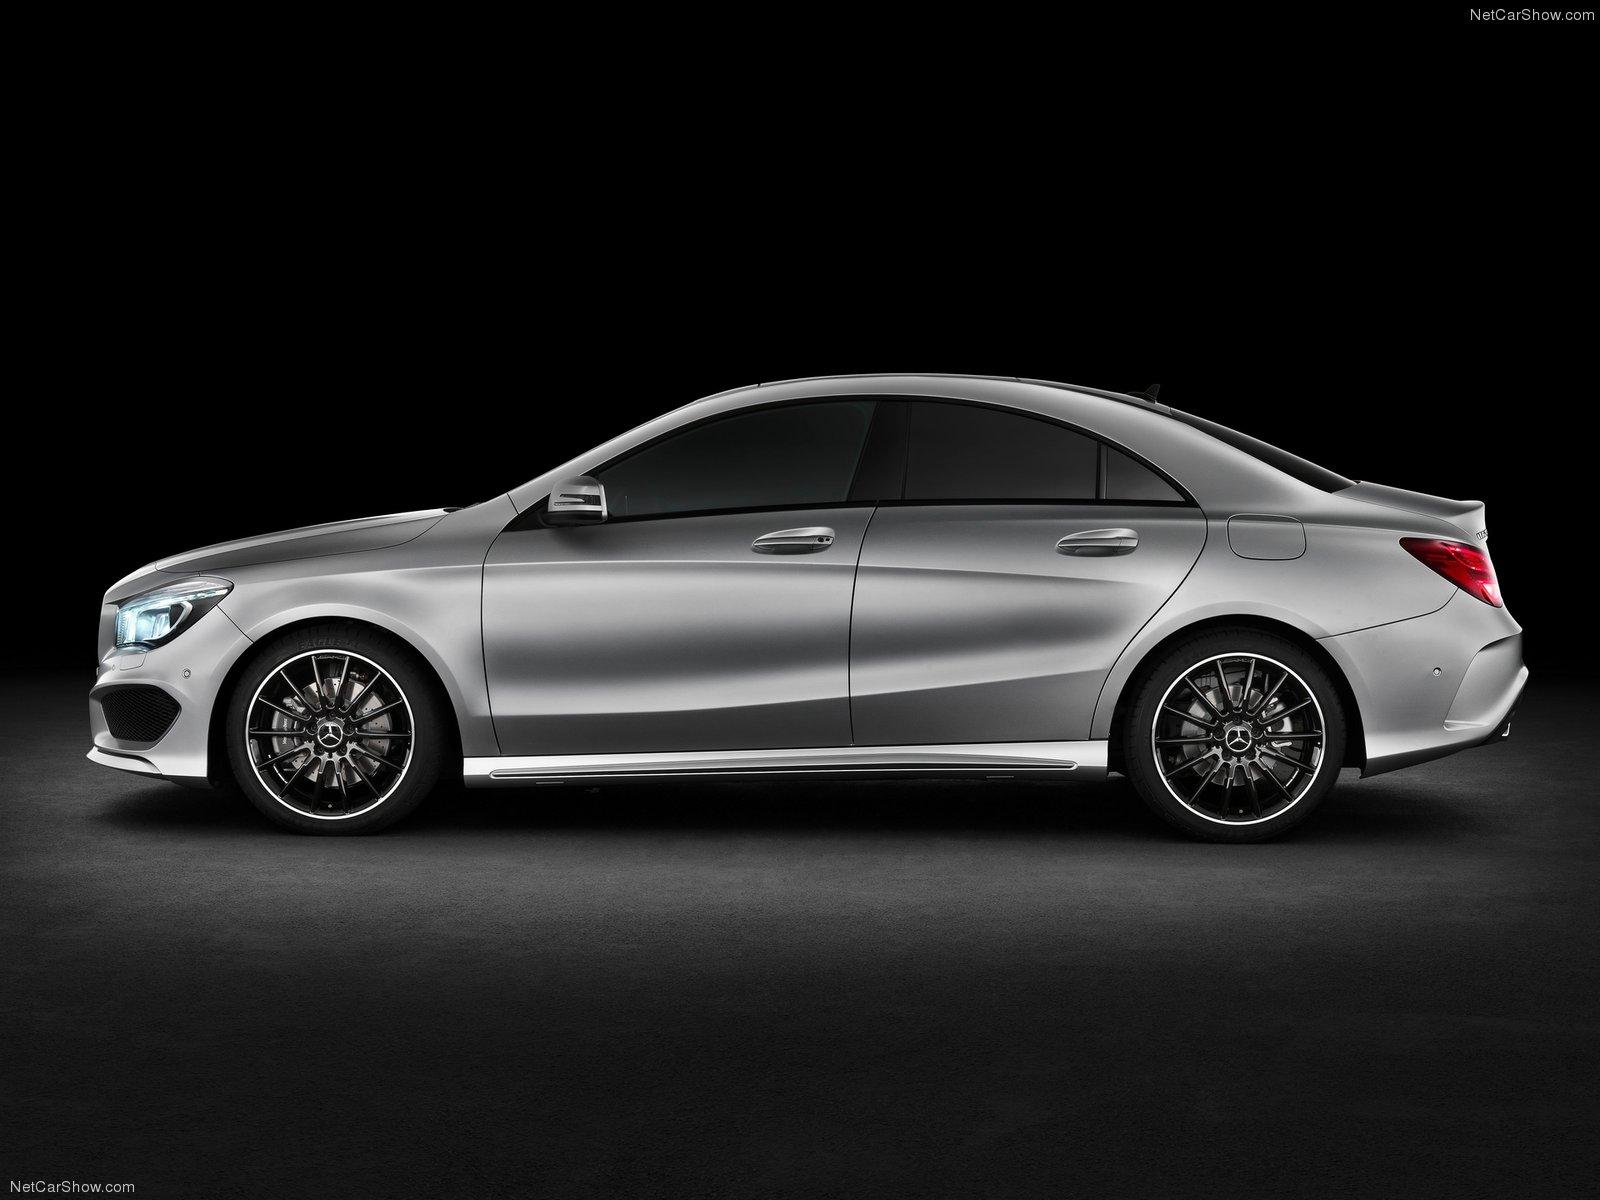 http://1.bp.blogspot.com/-a_sYeyfk-Eo/UQHi4yY3yWI/AAAAAAAAHuE/SqBlyeOH1dY/s1600/Mercedes-Benz-CLA-Class_2014_1600x1200_wallpaper_1e.jpg